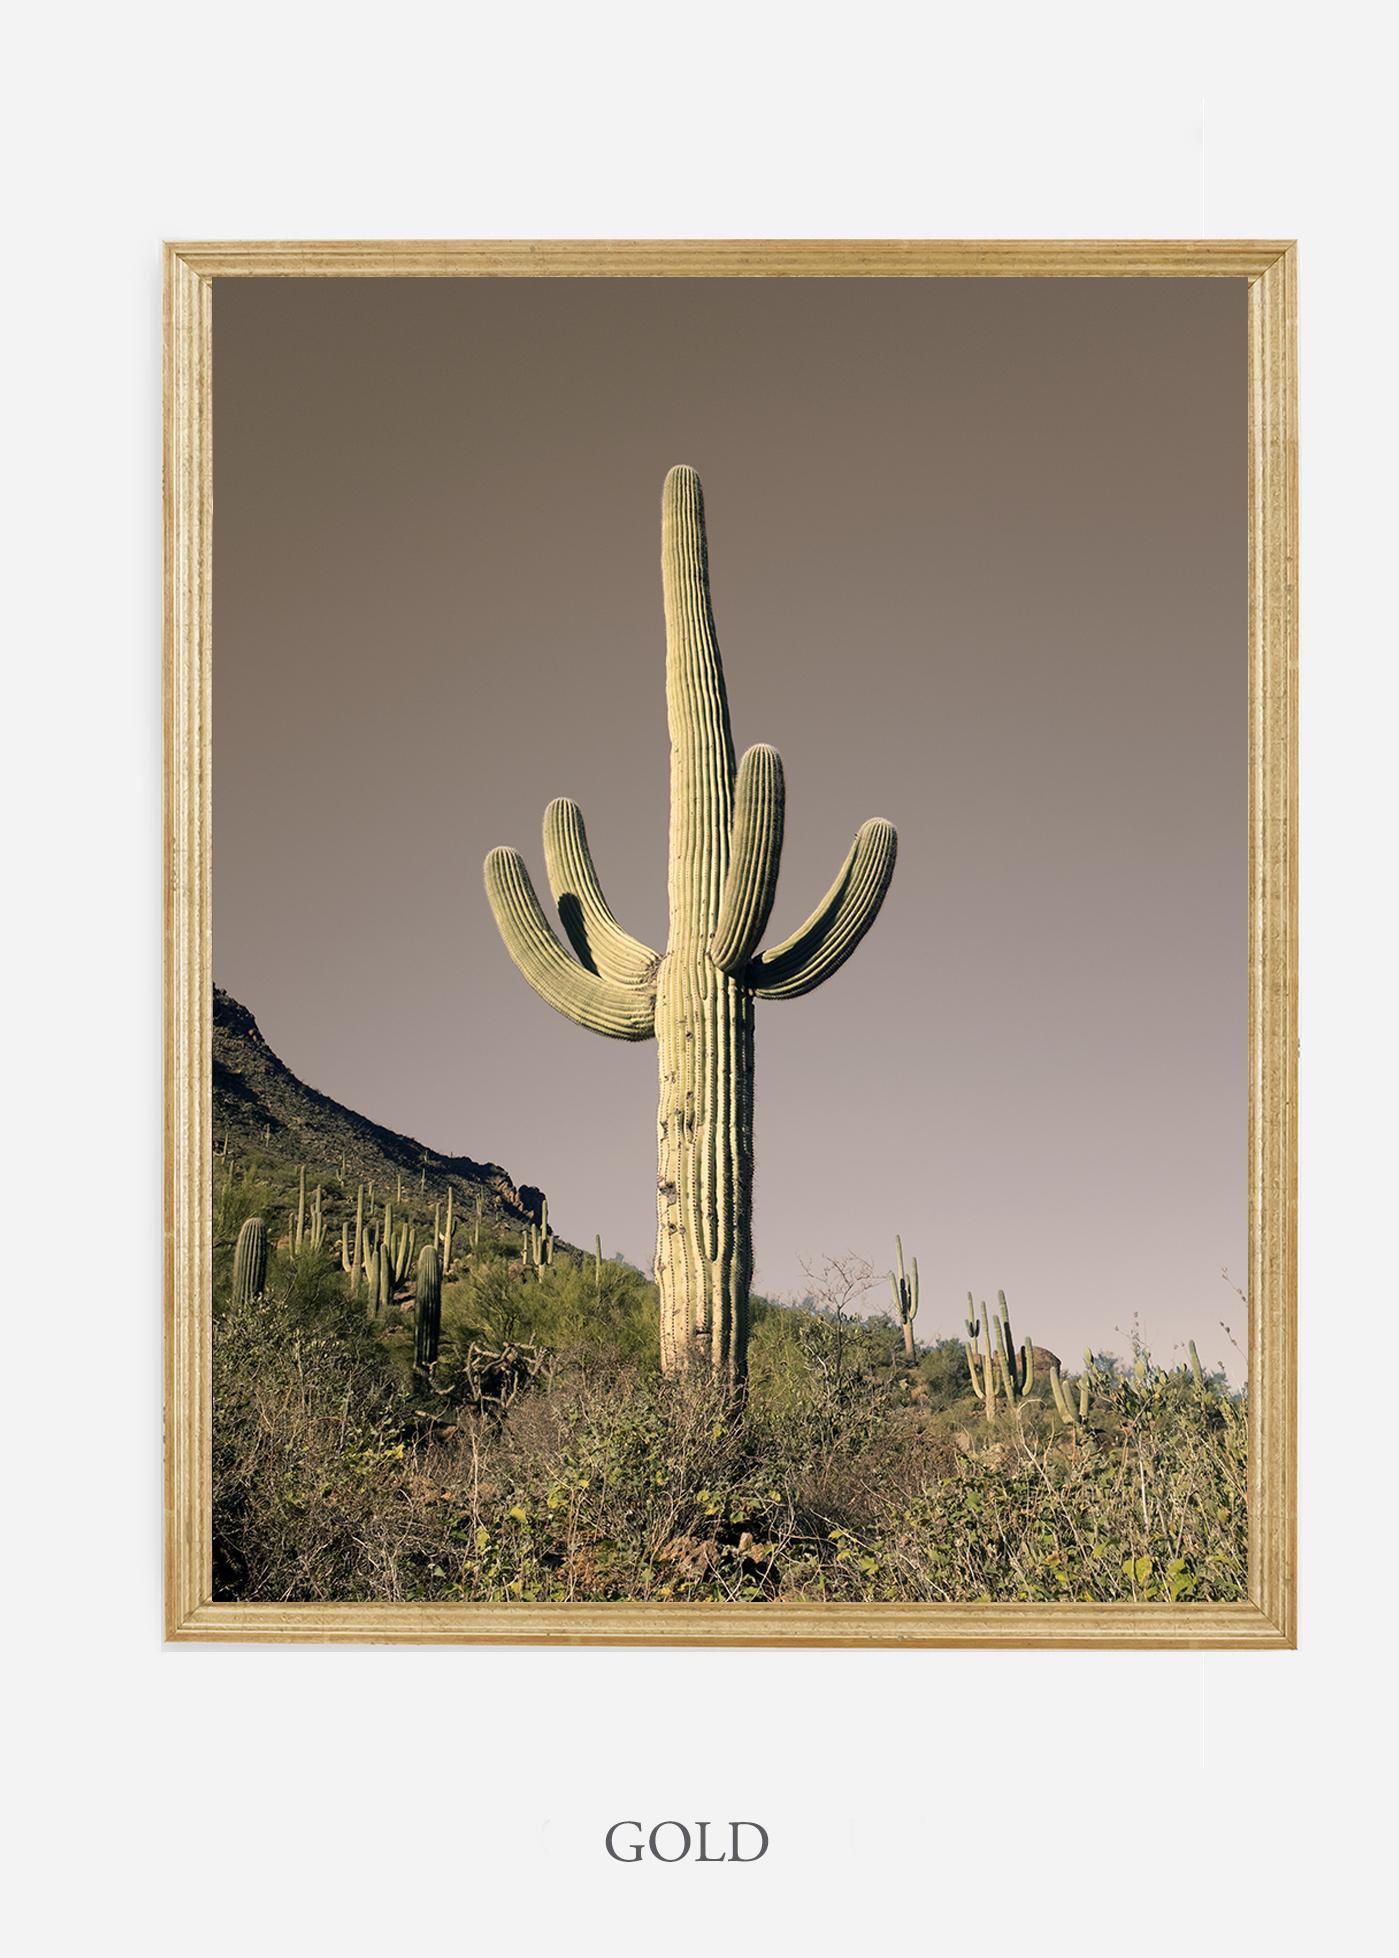 nomat-goldframe-saguaroNo.20-wildercalifornia-art-wallart-cactusprint-homedecor-prints-arizona-botanical-artwork-interiordesign.jpg